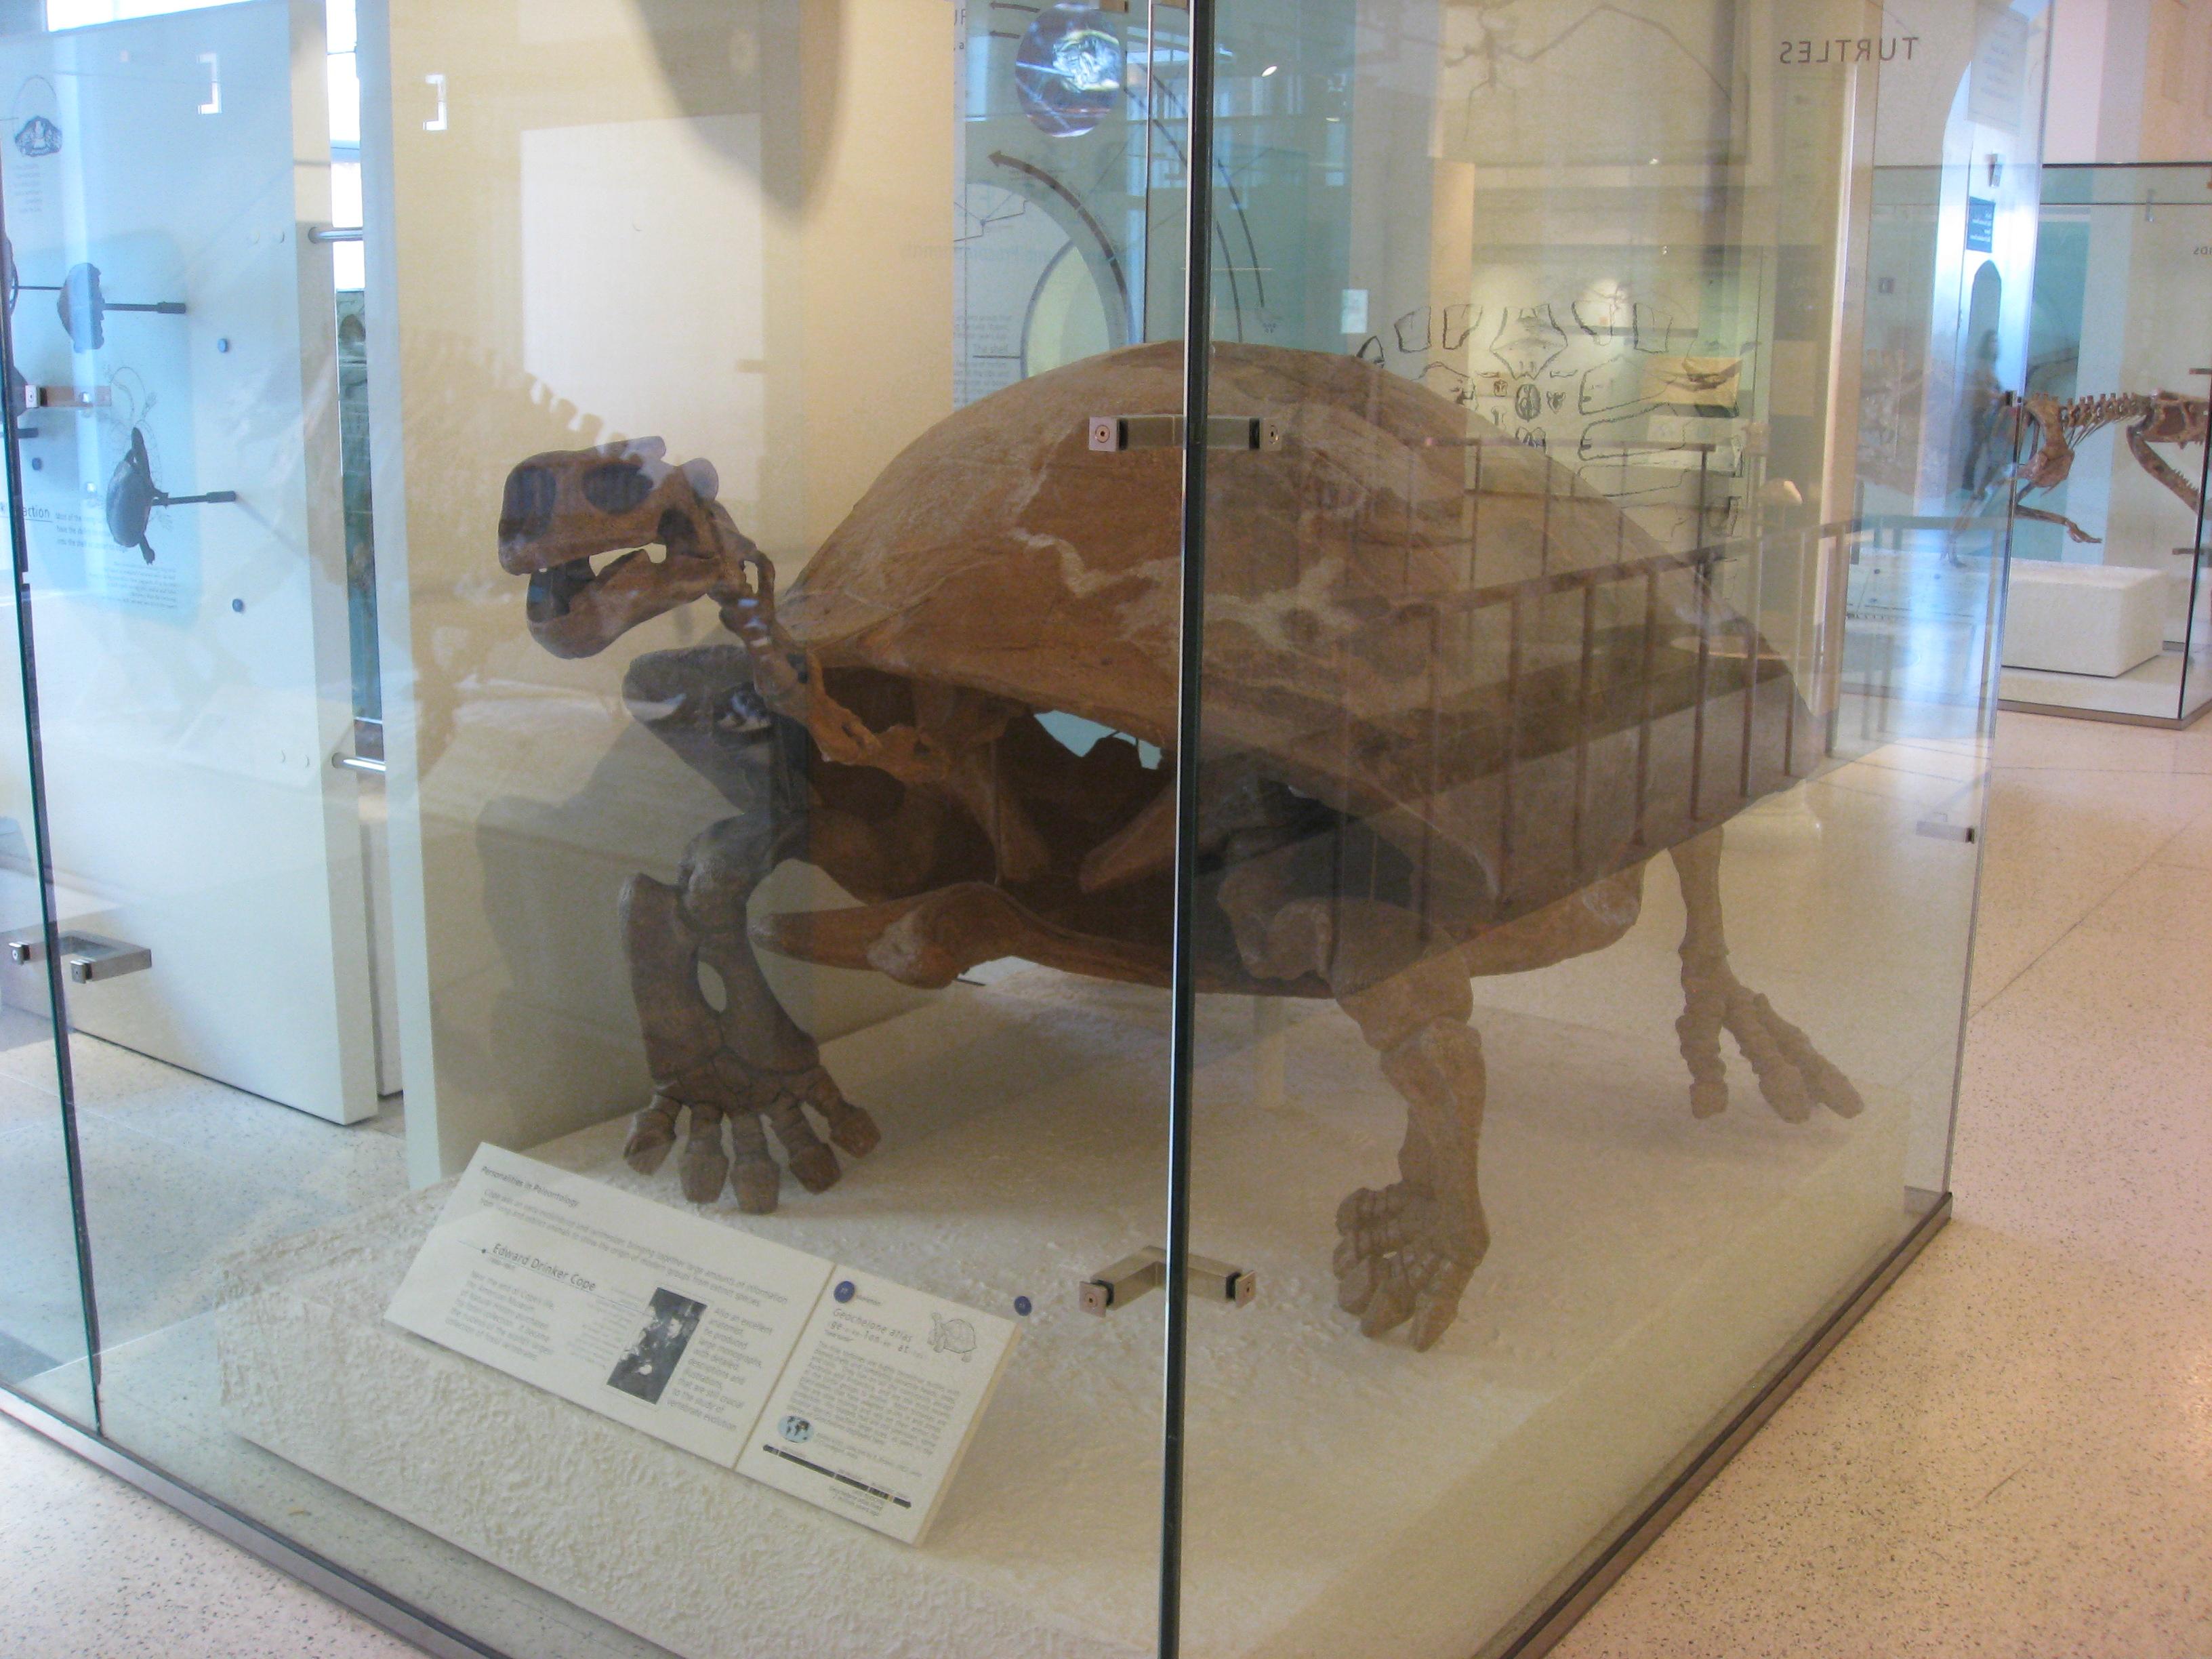 AMNH20141114c